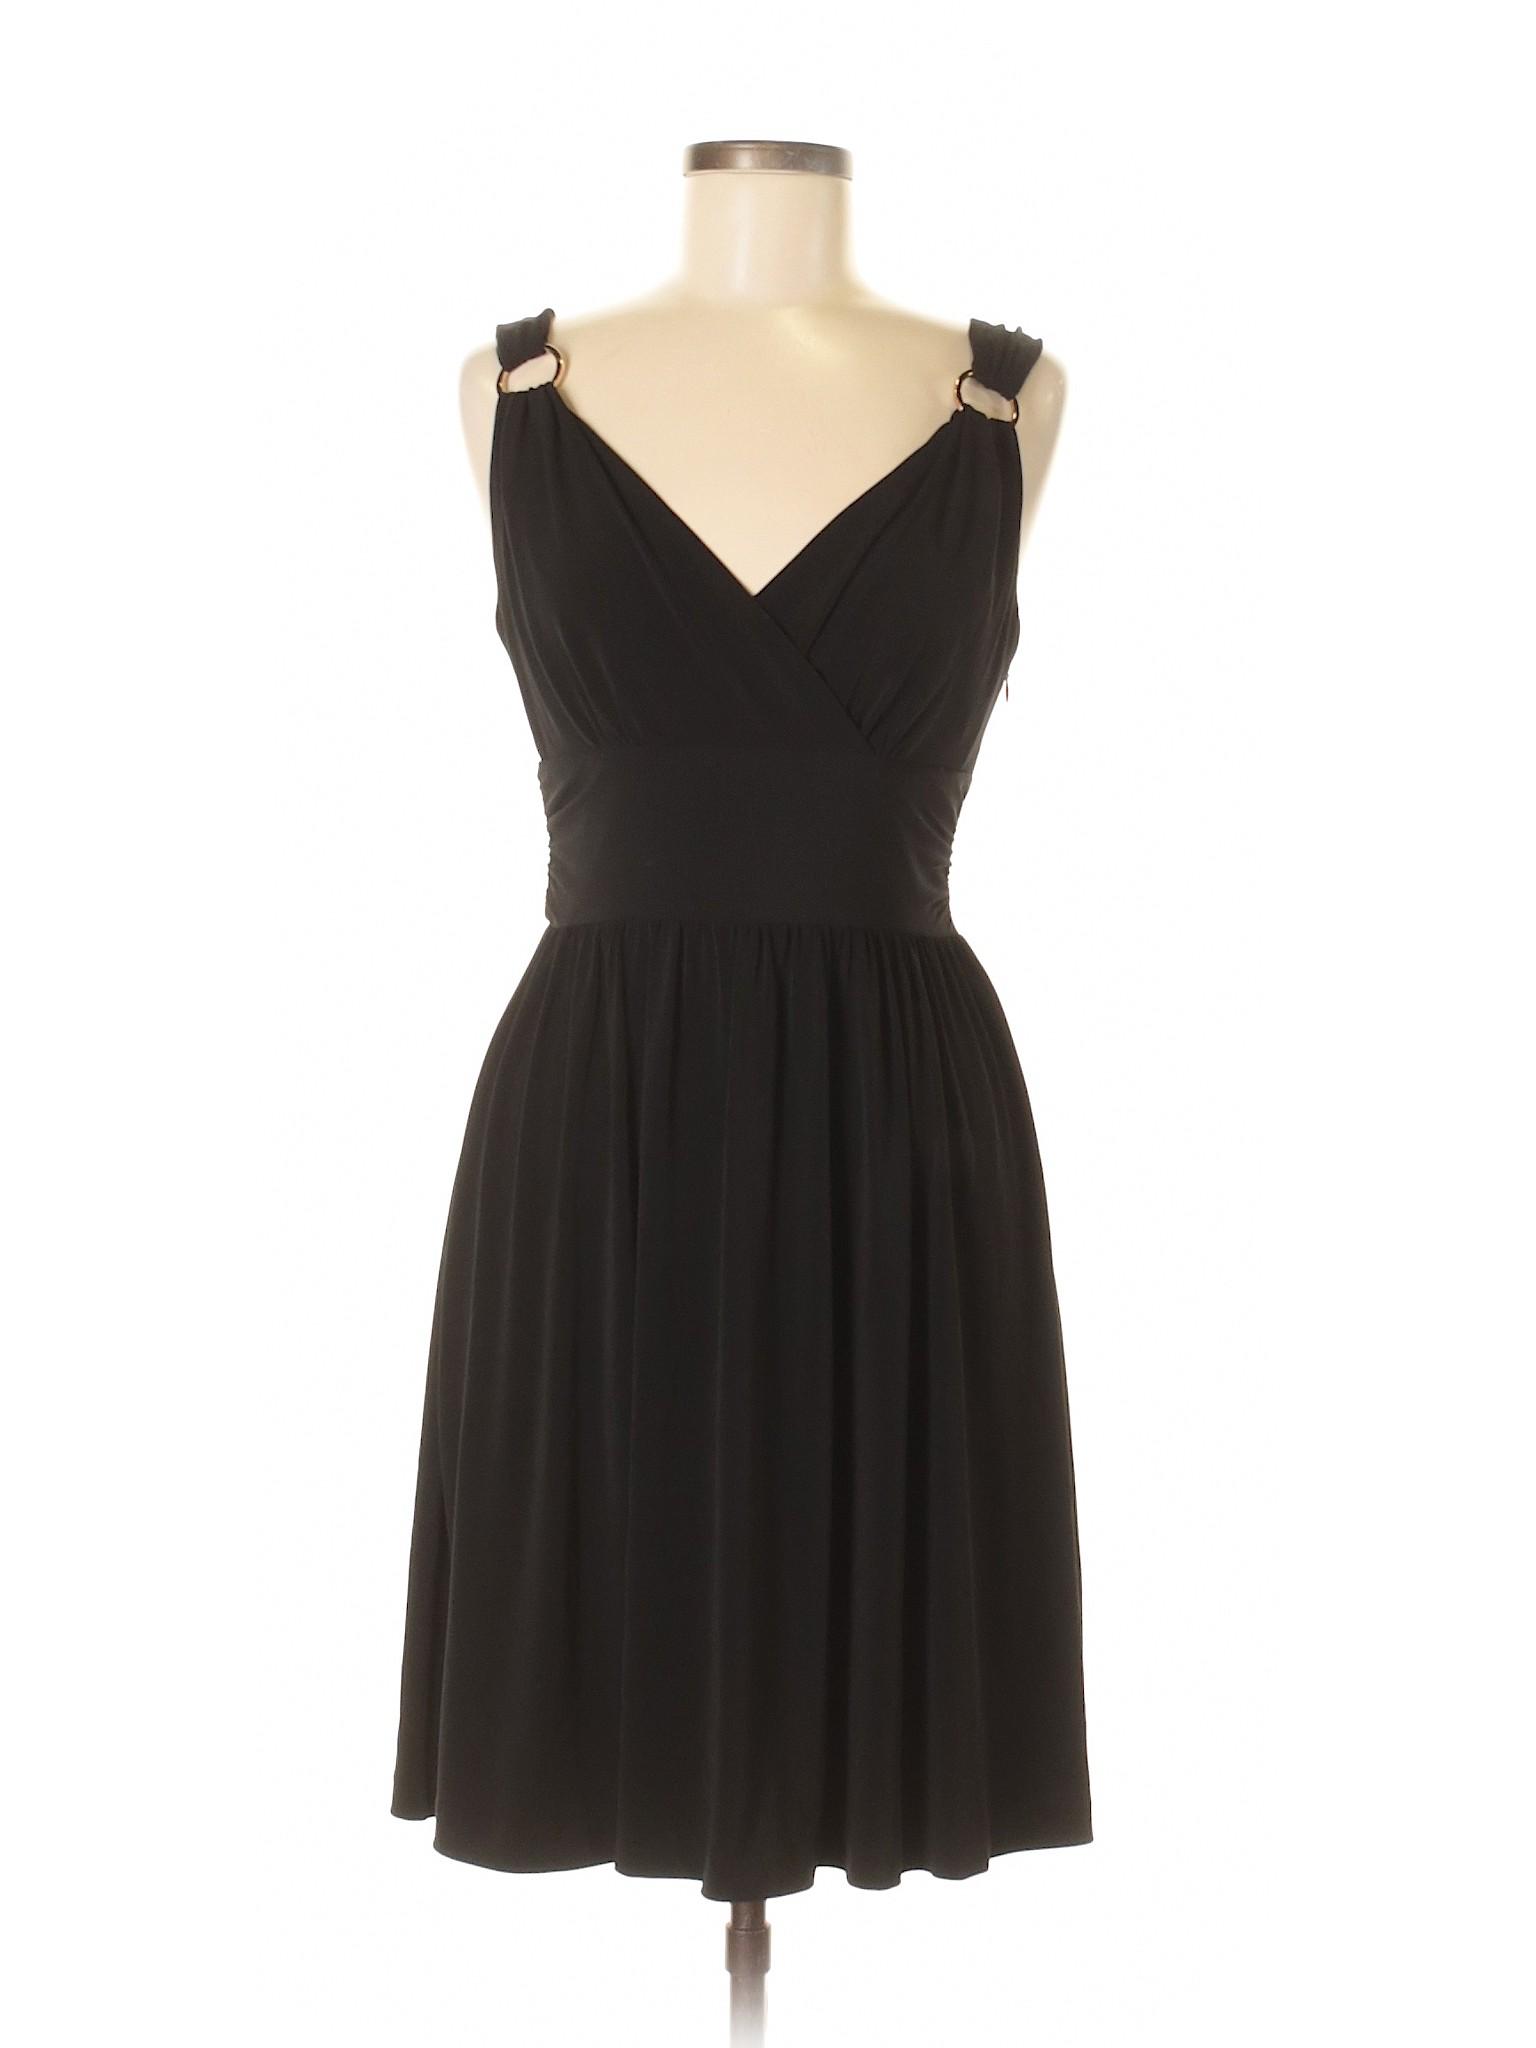 White Casual Black Selling House Market Dress IwvZWqHd